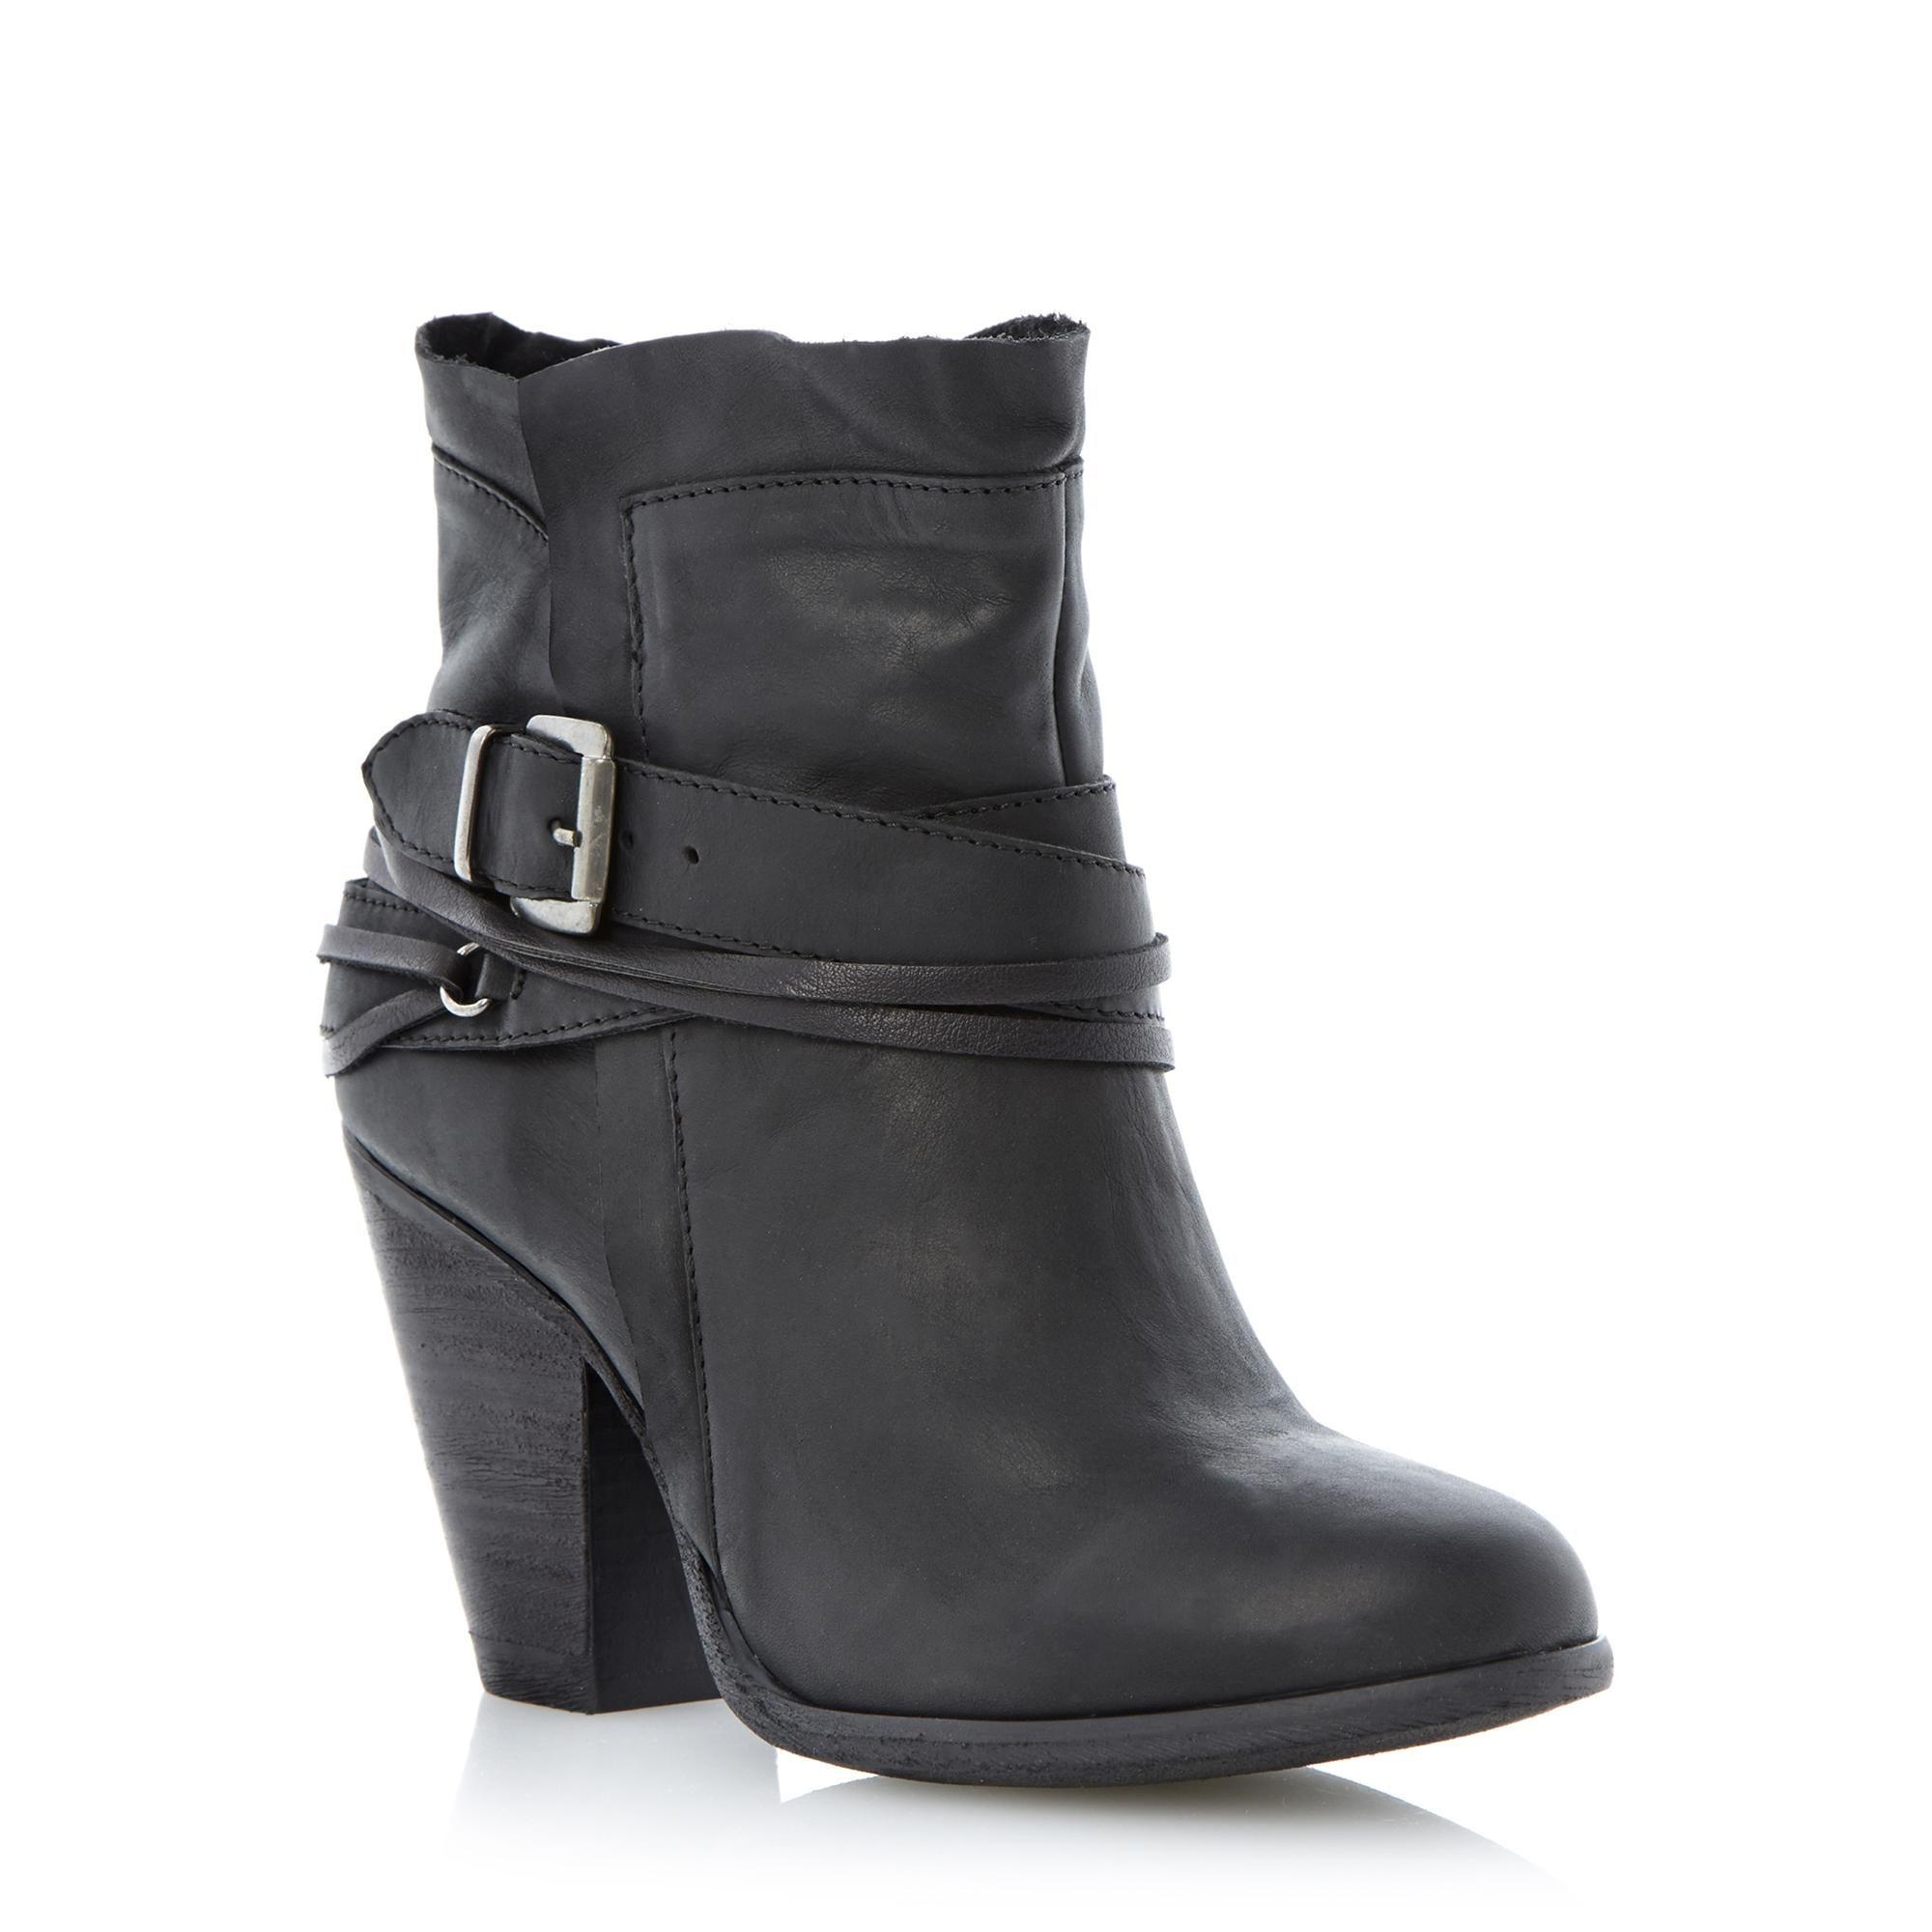 1fa66988531 STEVE MADDEN RAFFA - Buckle Trim Western Style Ankle Boot - black ...